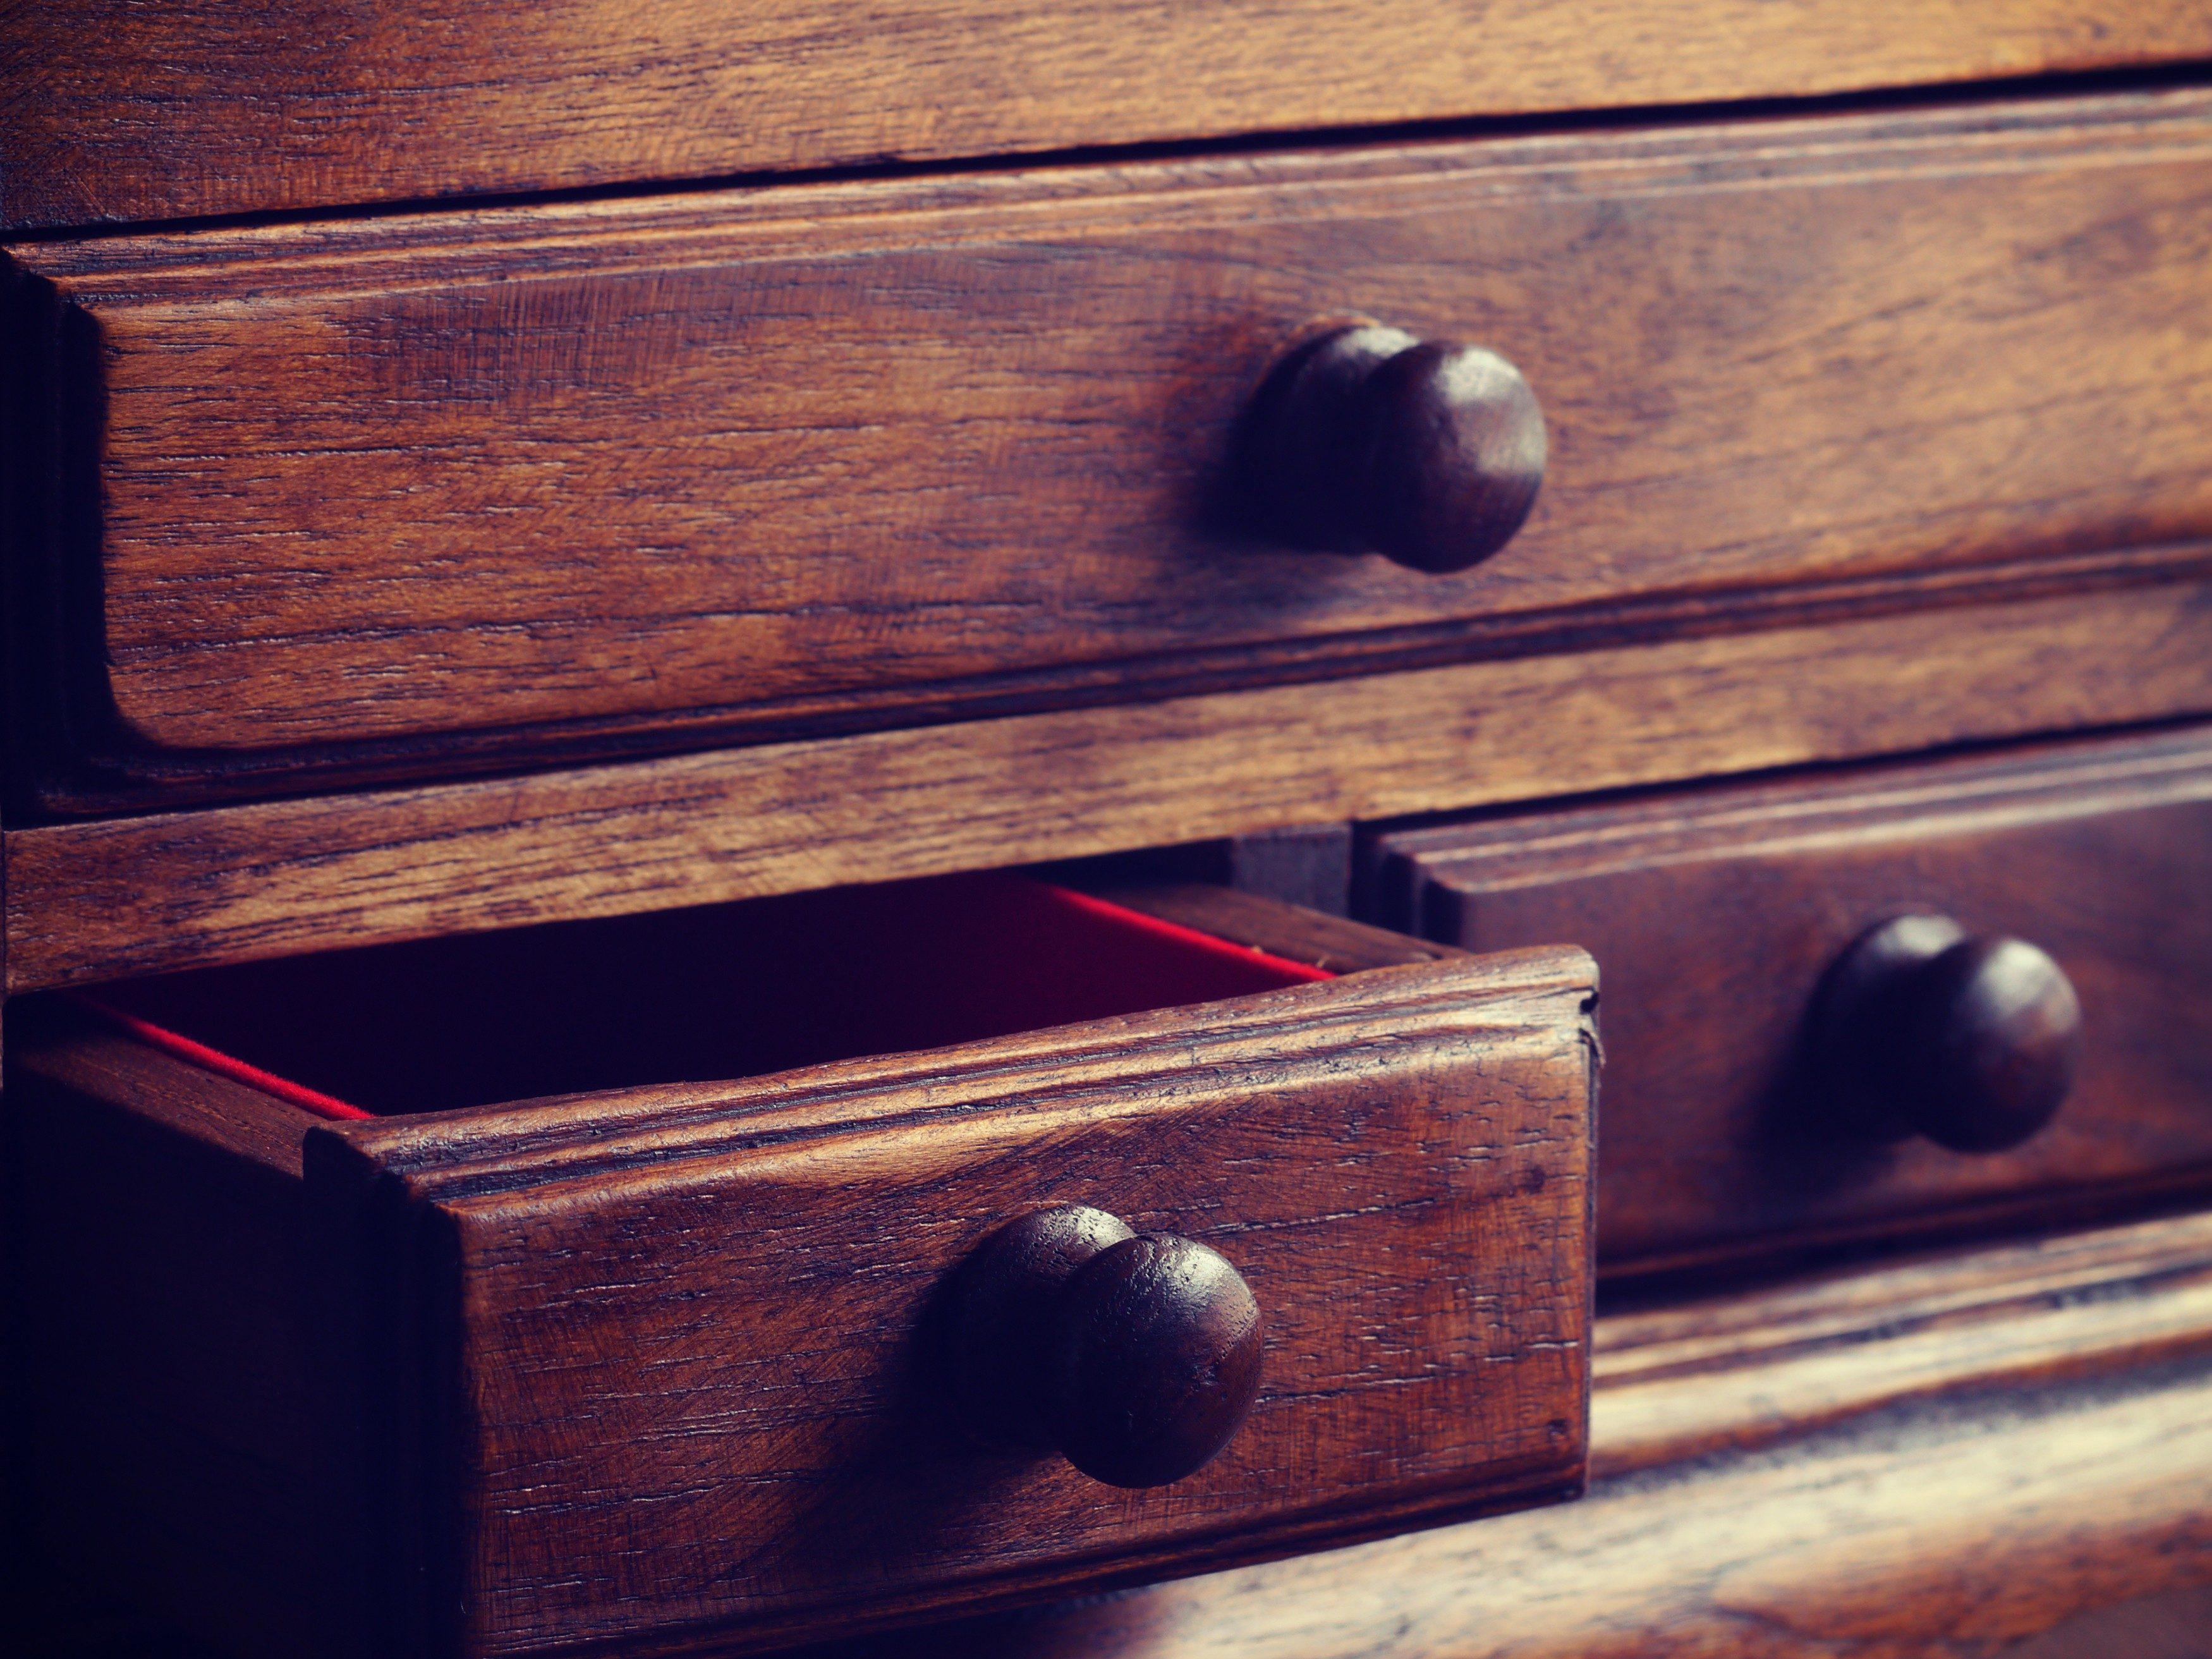 4. Use Beer to Clean Wood Furniture